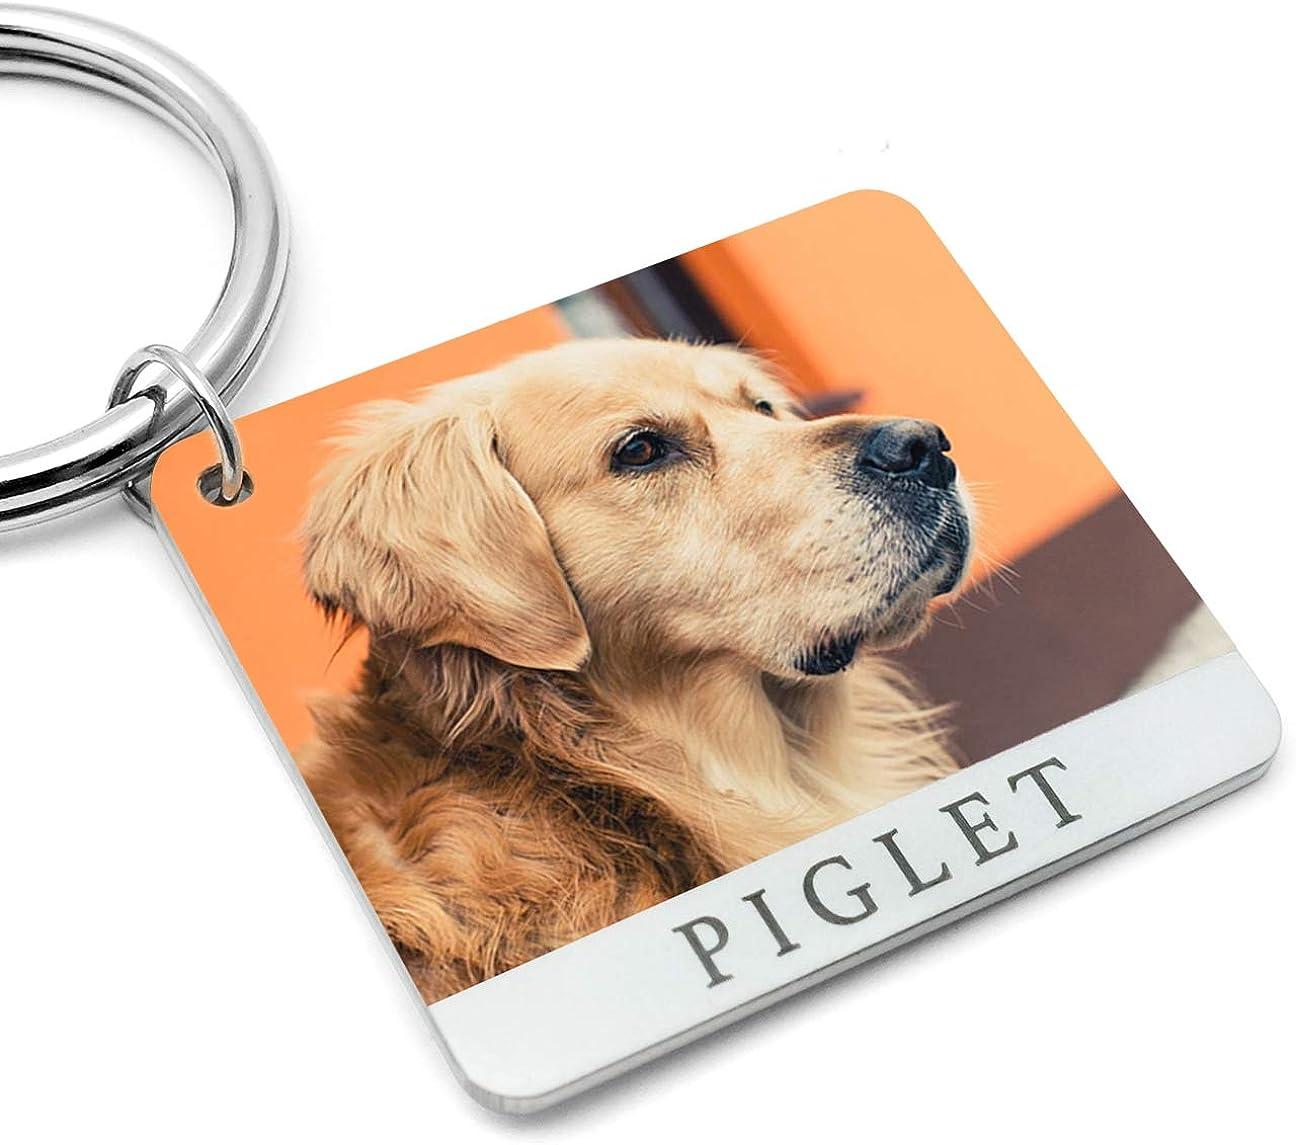 Custom Keychain,Picture Keyring,Cat Dog Photo Keychain,Pet Keychain,Personalized Pet Portrait Keychain,Dog Lover Gifts